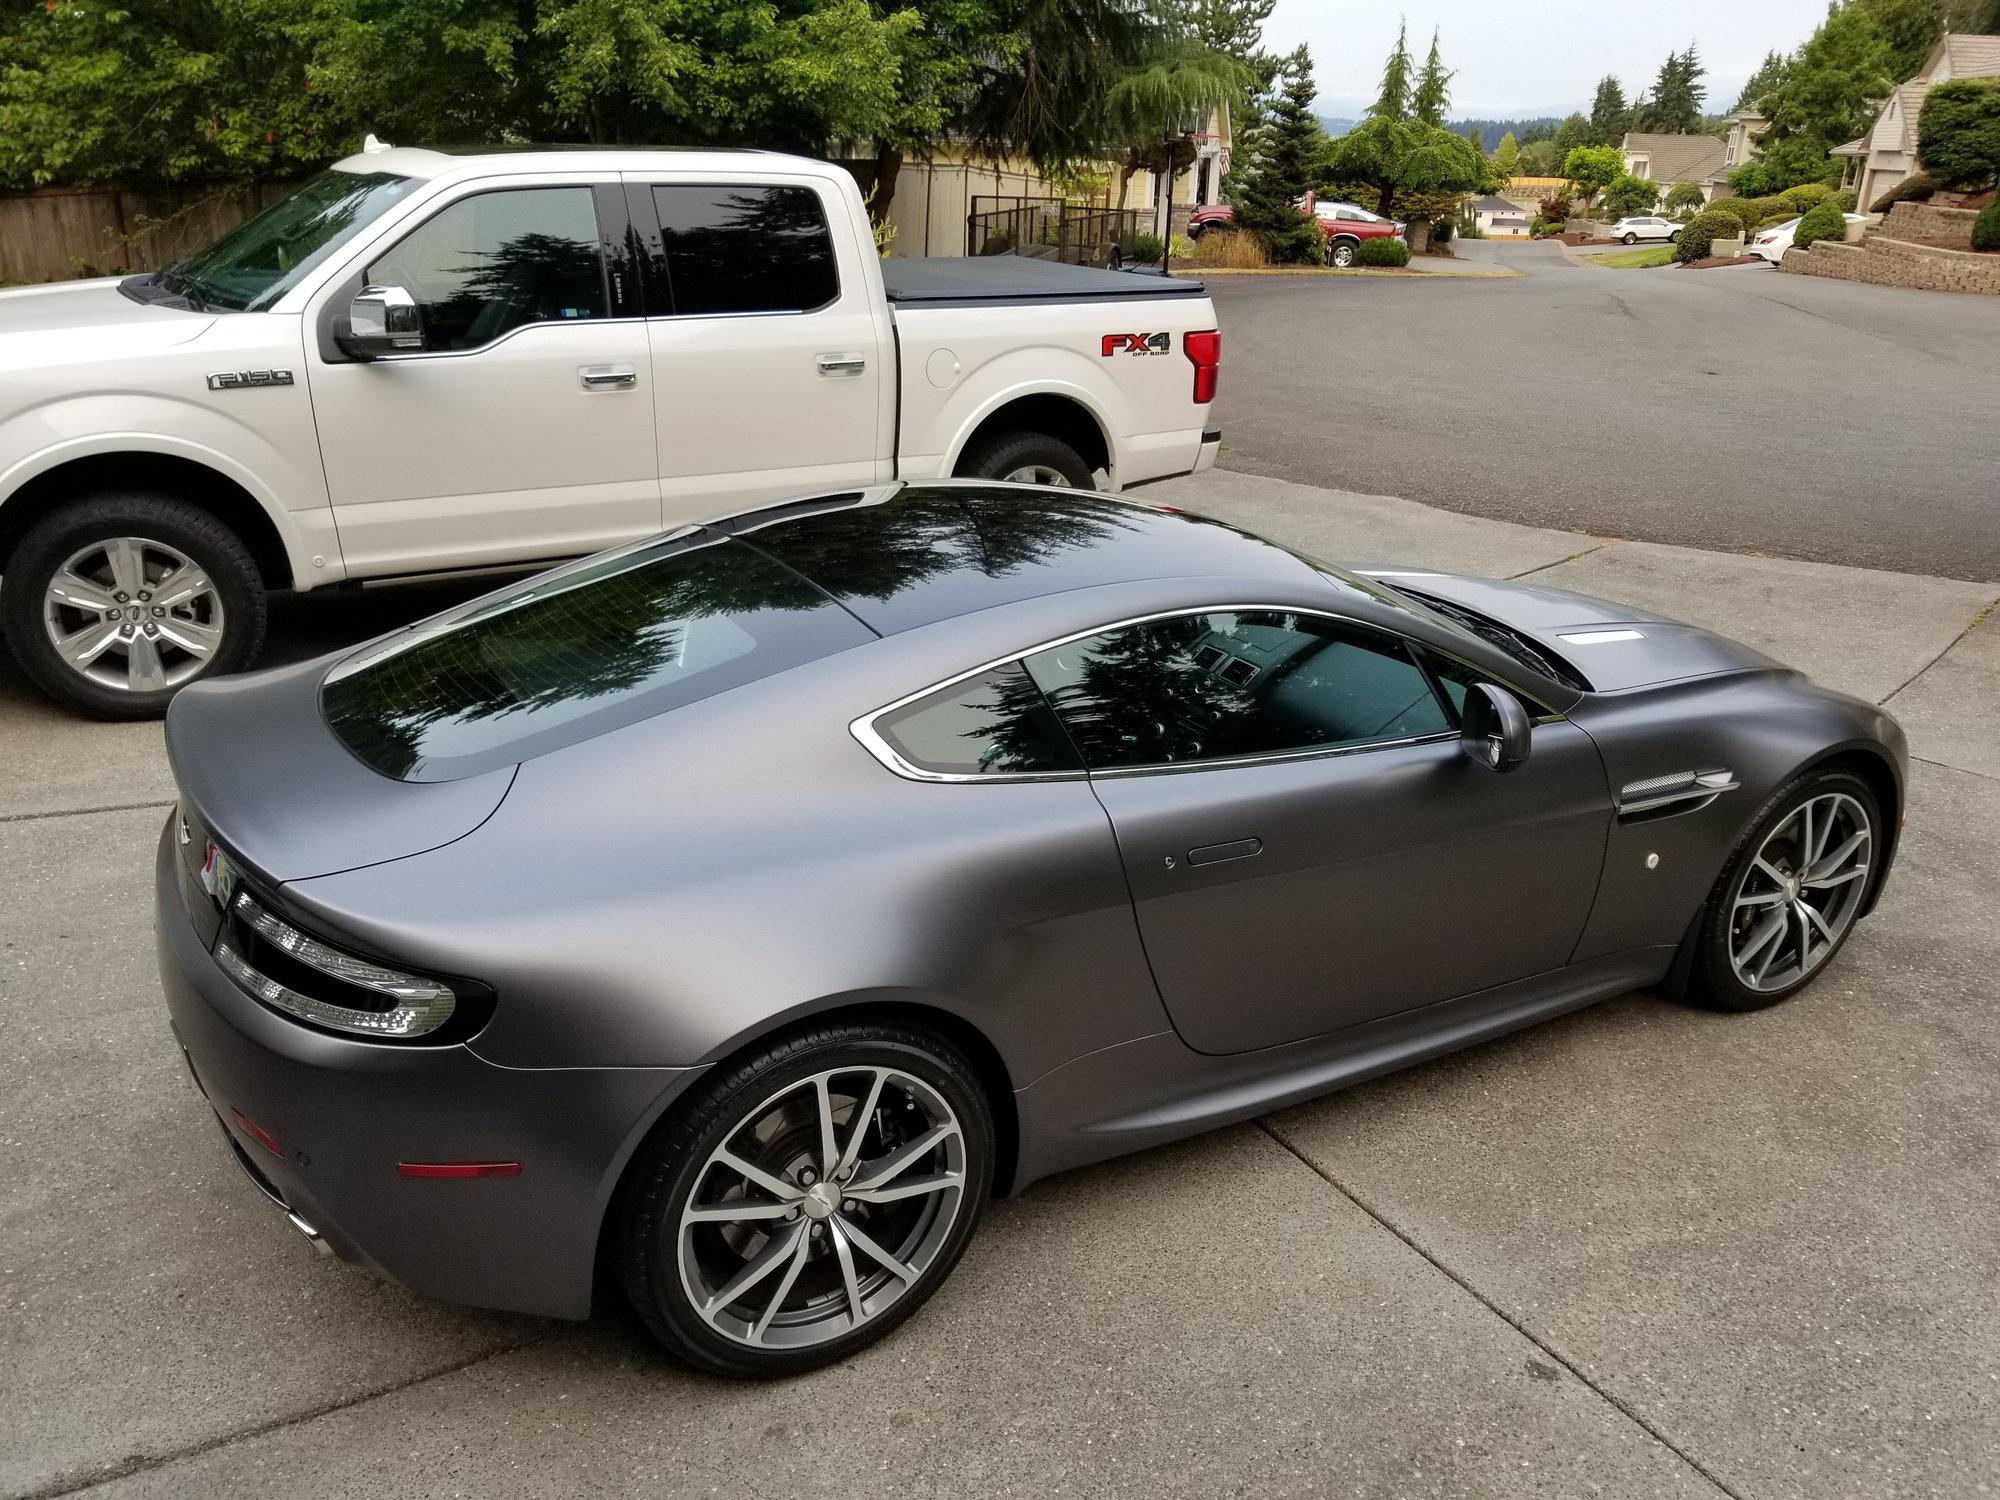 Best Silver Color 6speedonline Porsche Forum And Luxury Car Resource